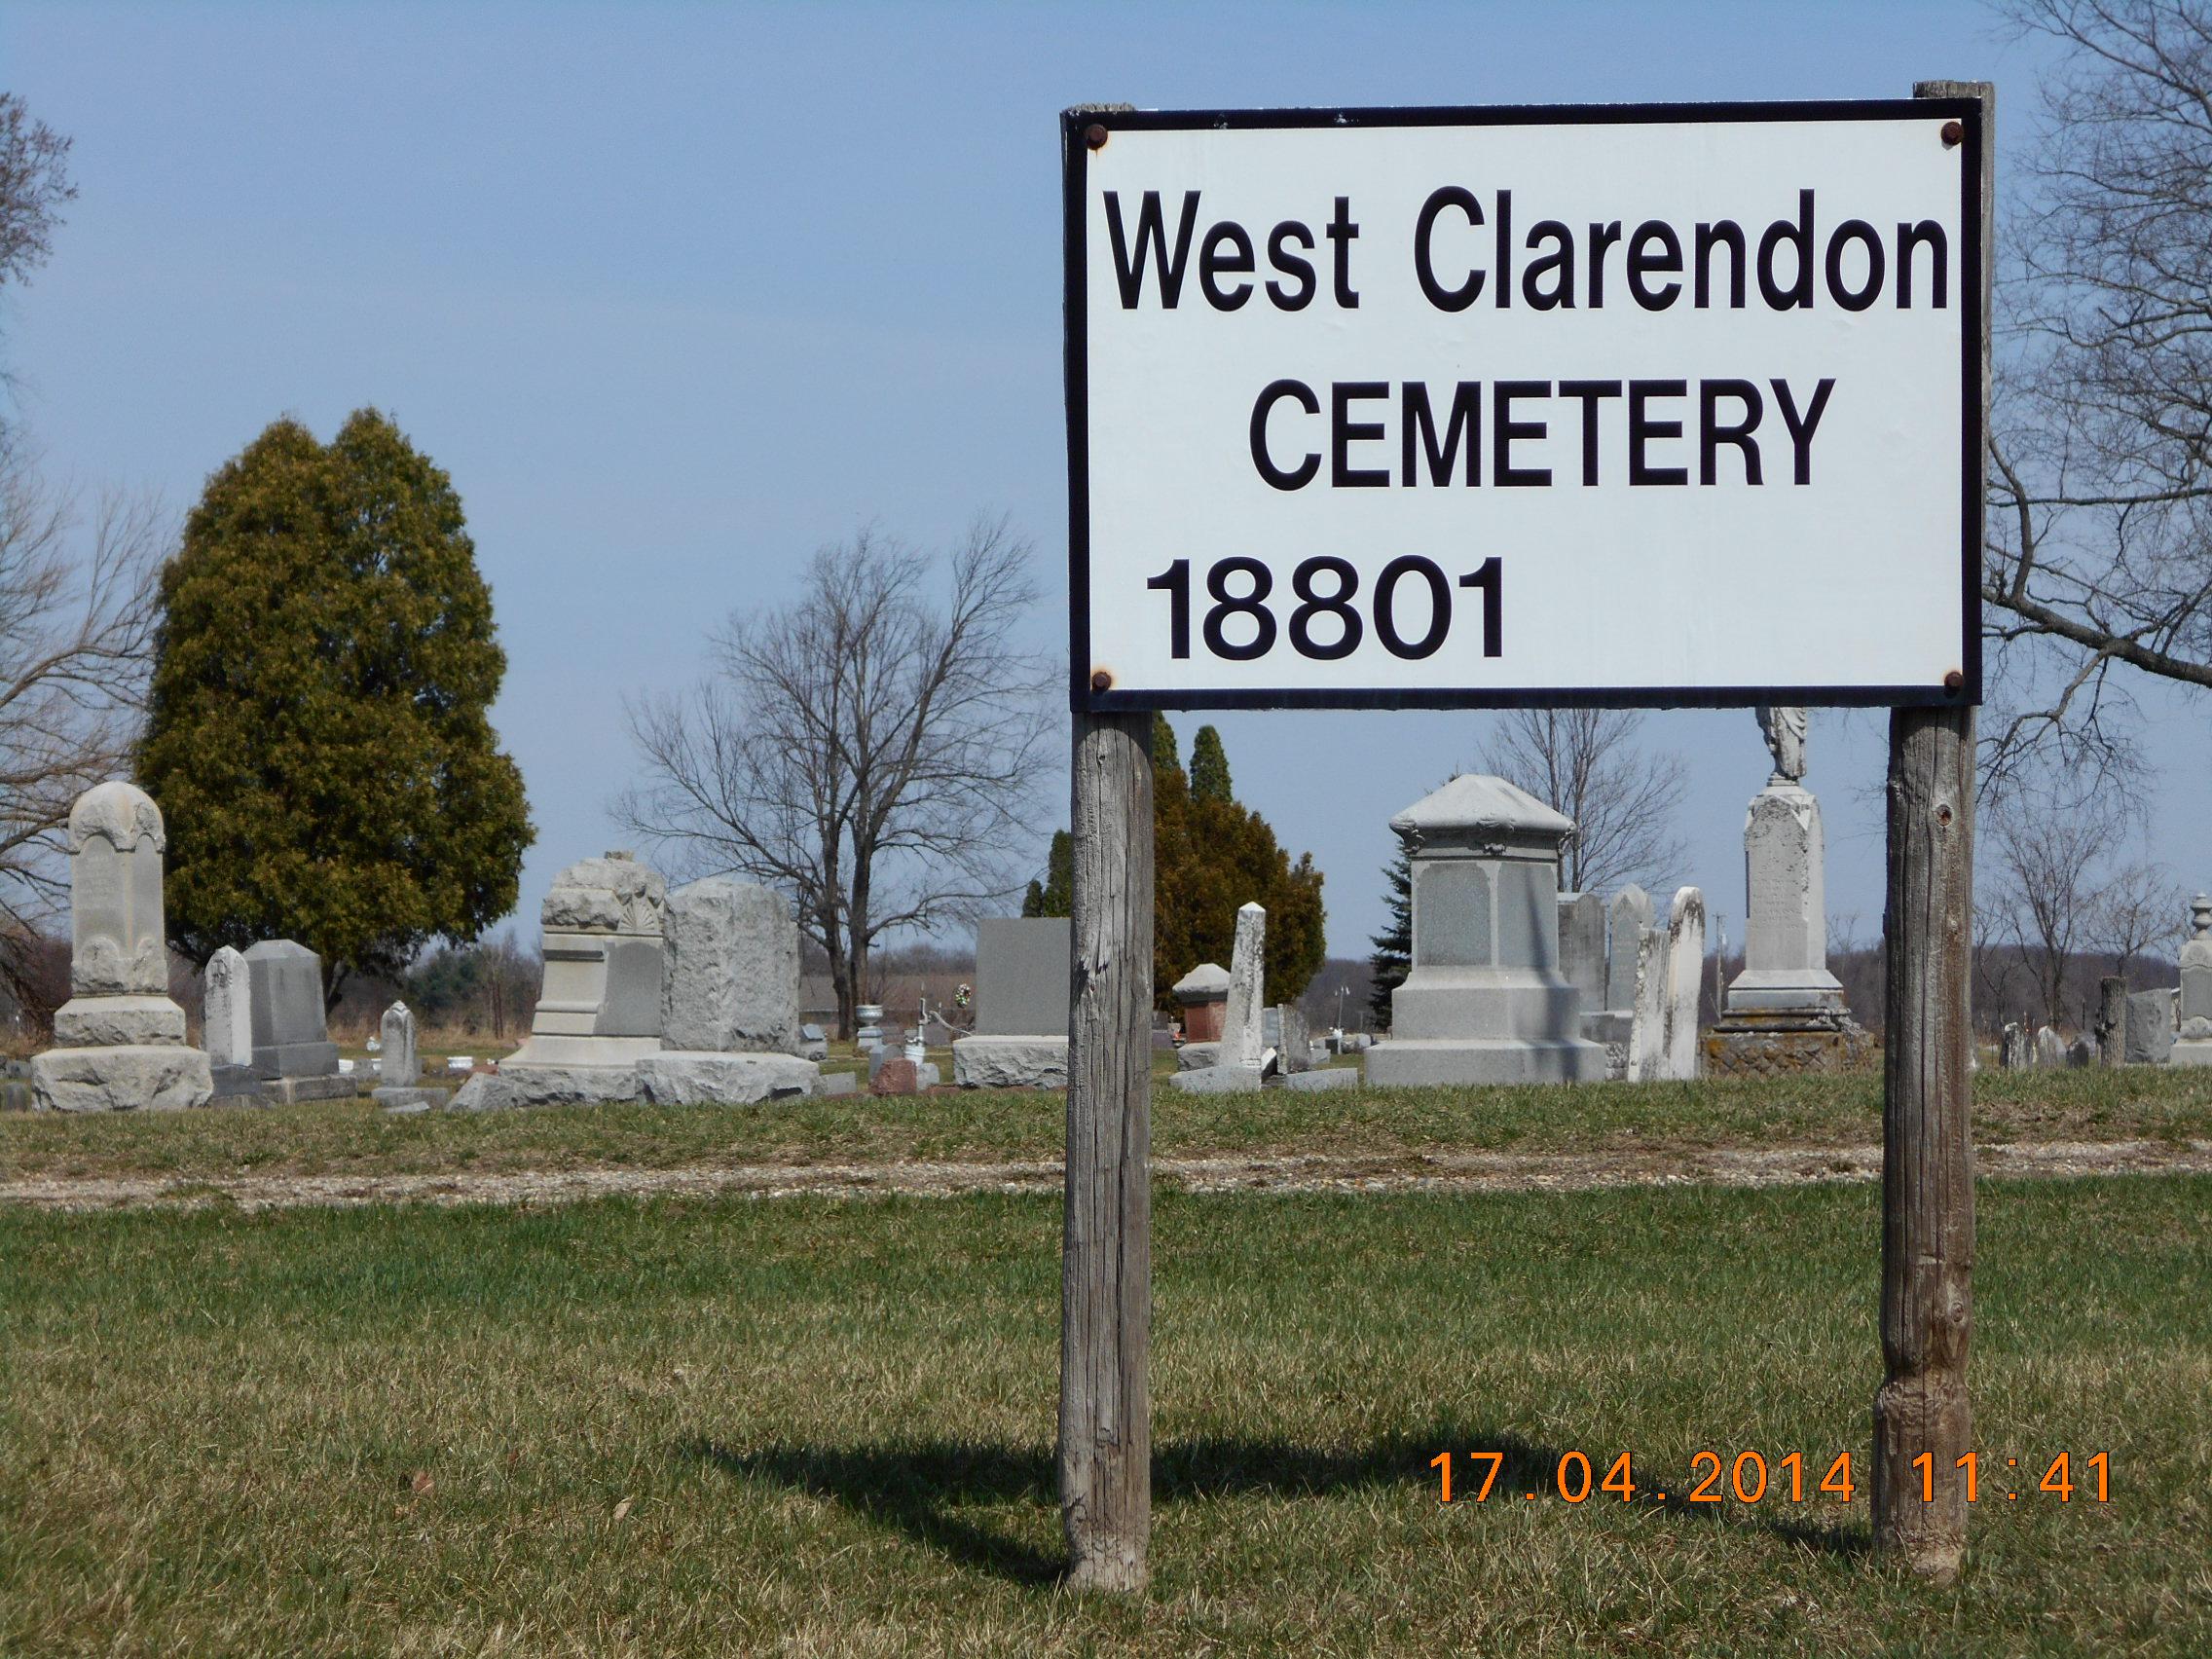 West Clarendon Cemetery